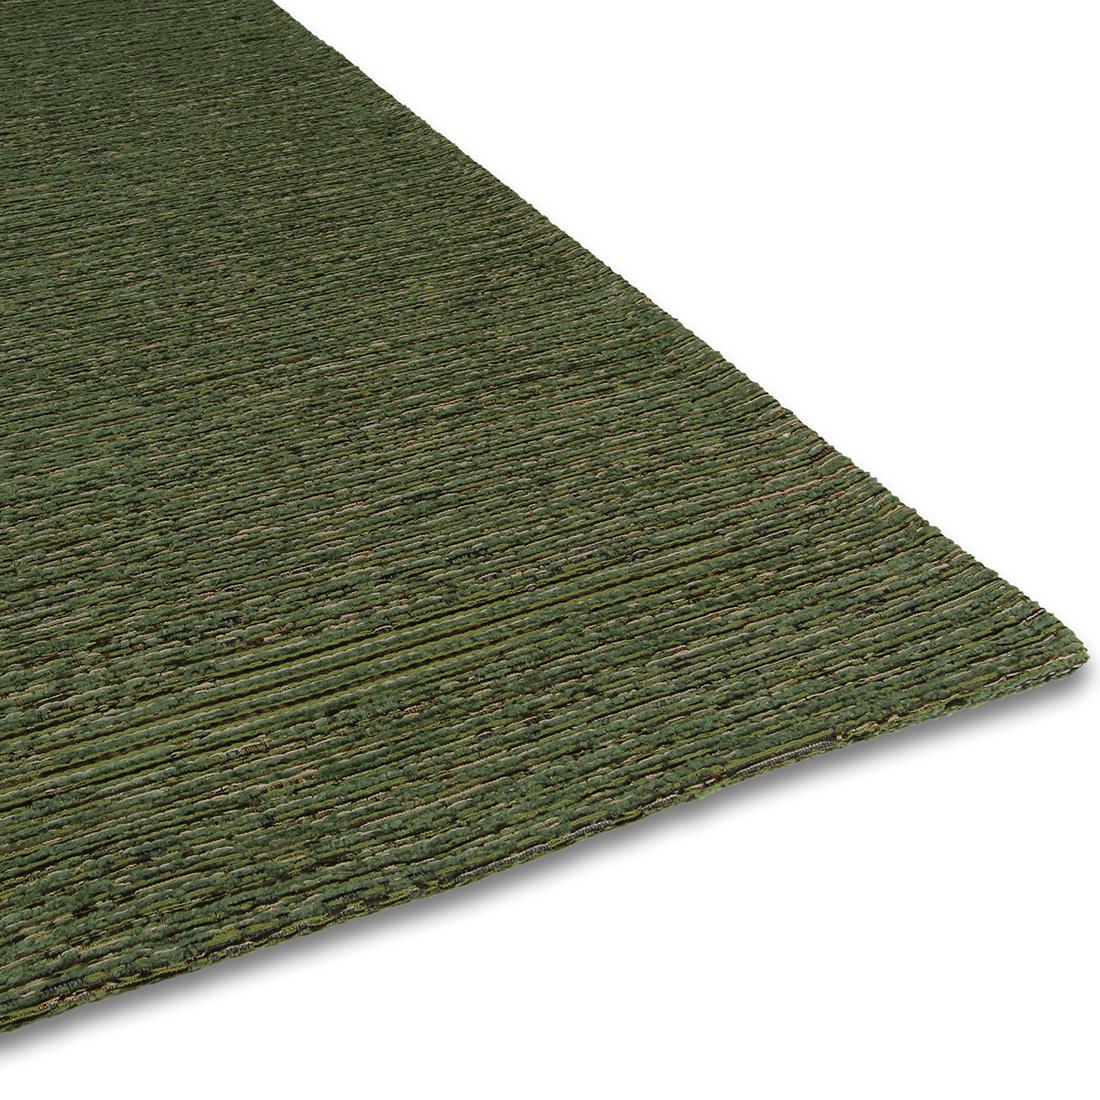 Vloerkleed Brinker Bolzano Army Green | 200 x 300 cm